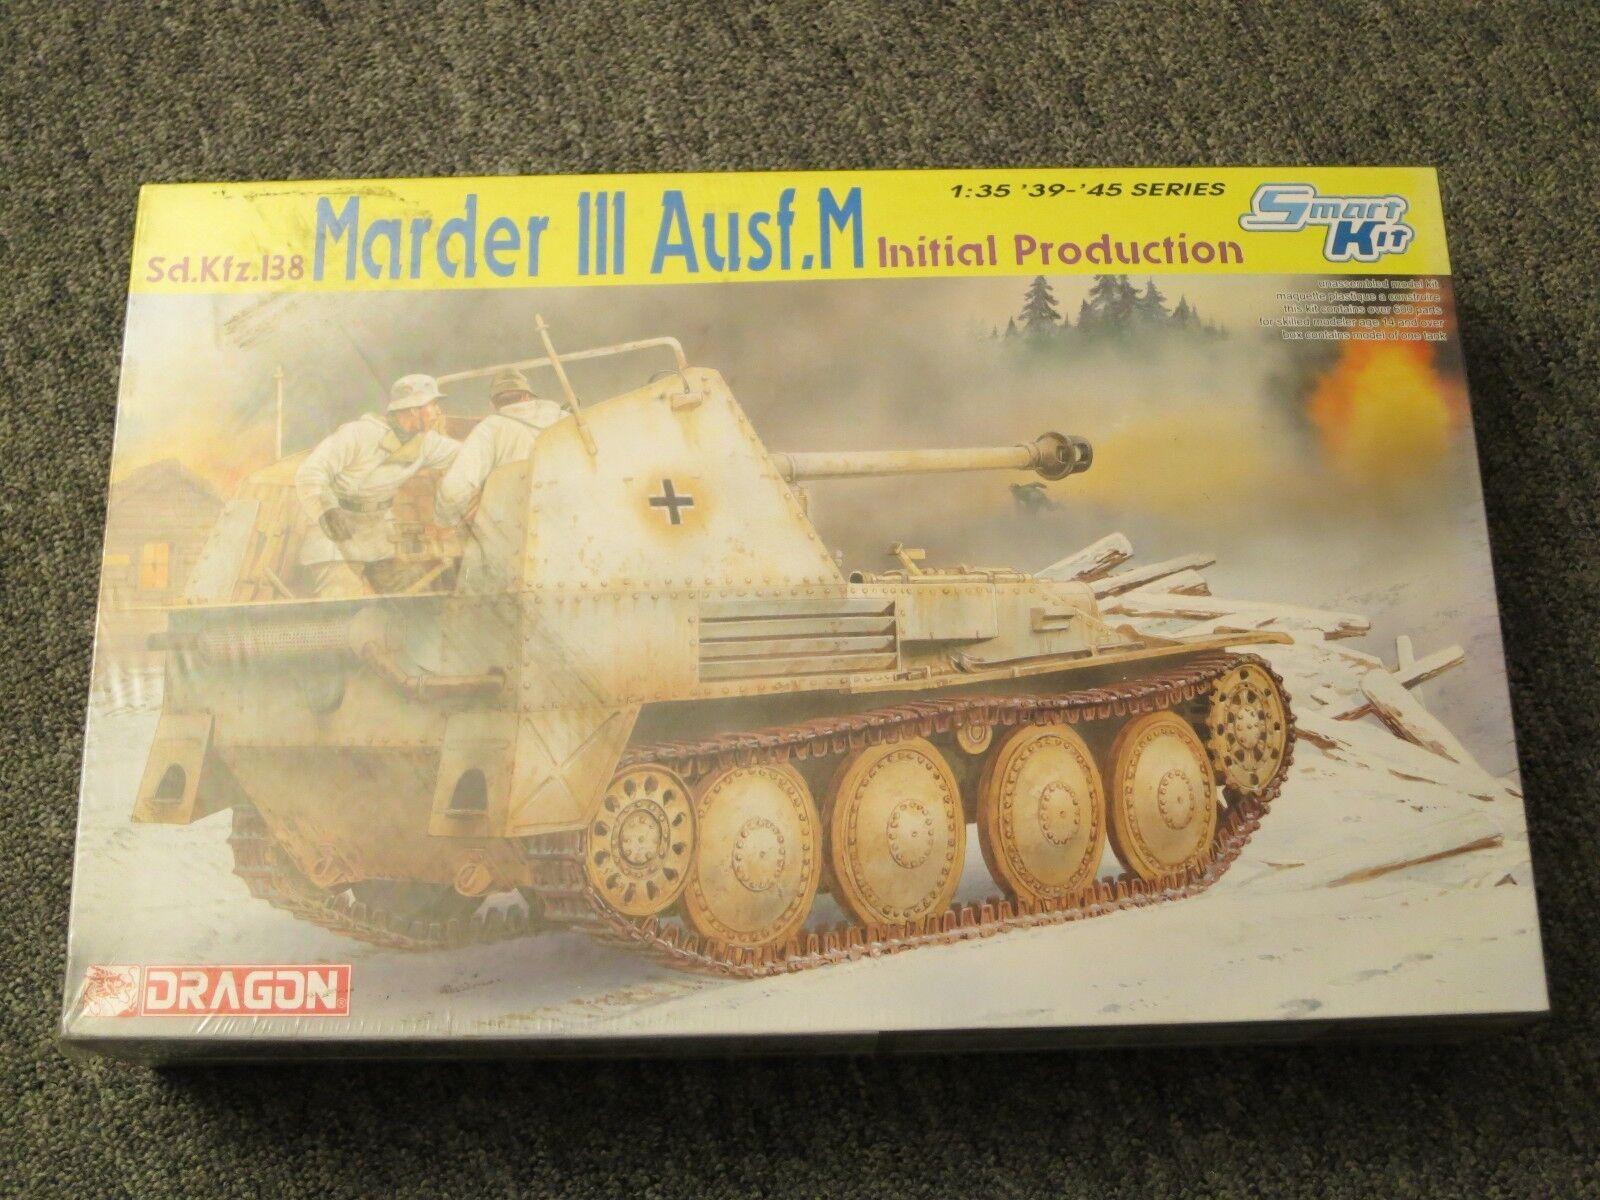 DRAGON 1 35 Sd.Kfz.138 Marder III Ausf.M Initial Prod. Kit '39-'45 Series